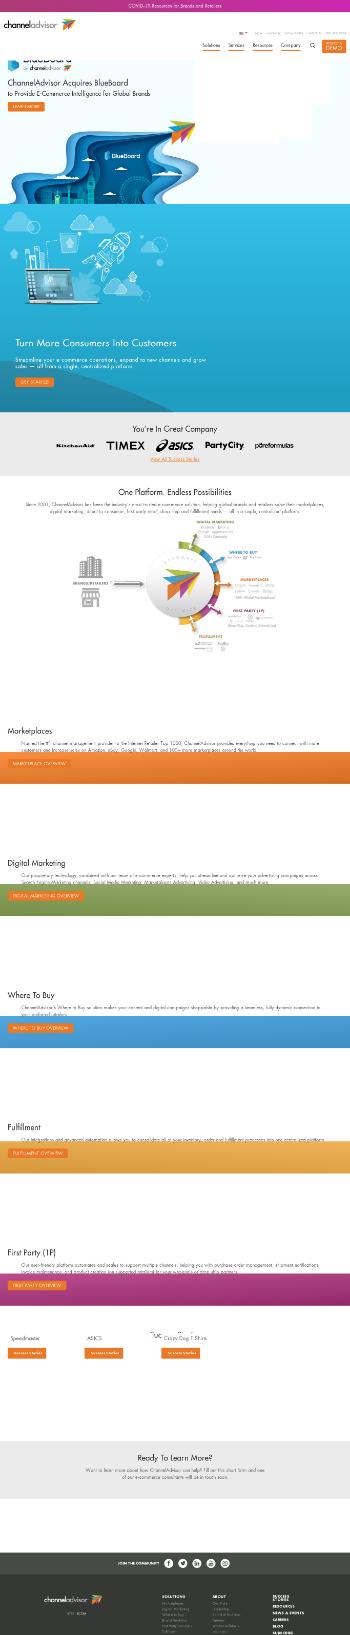 ChannelAdvisor Corporation Website Screenshot